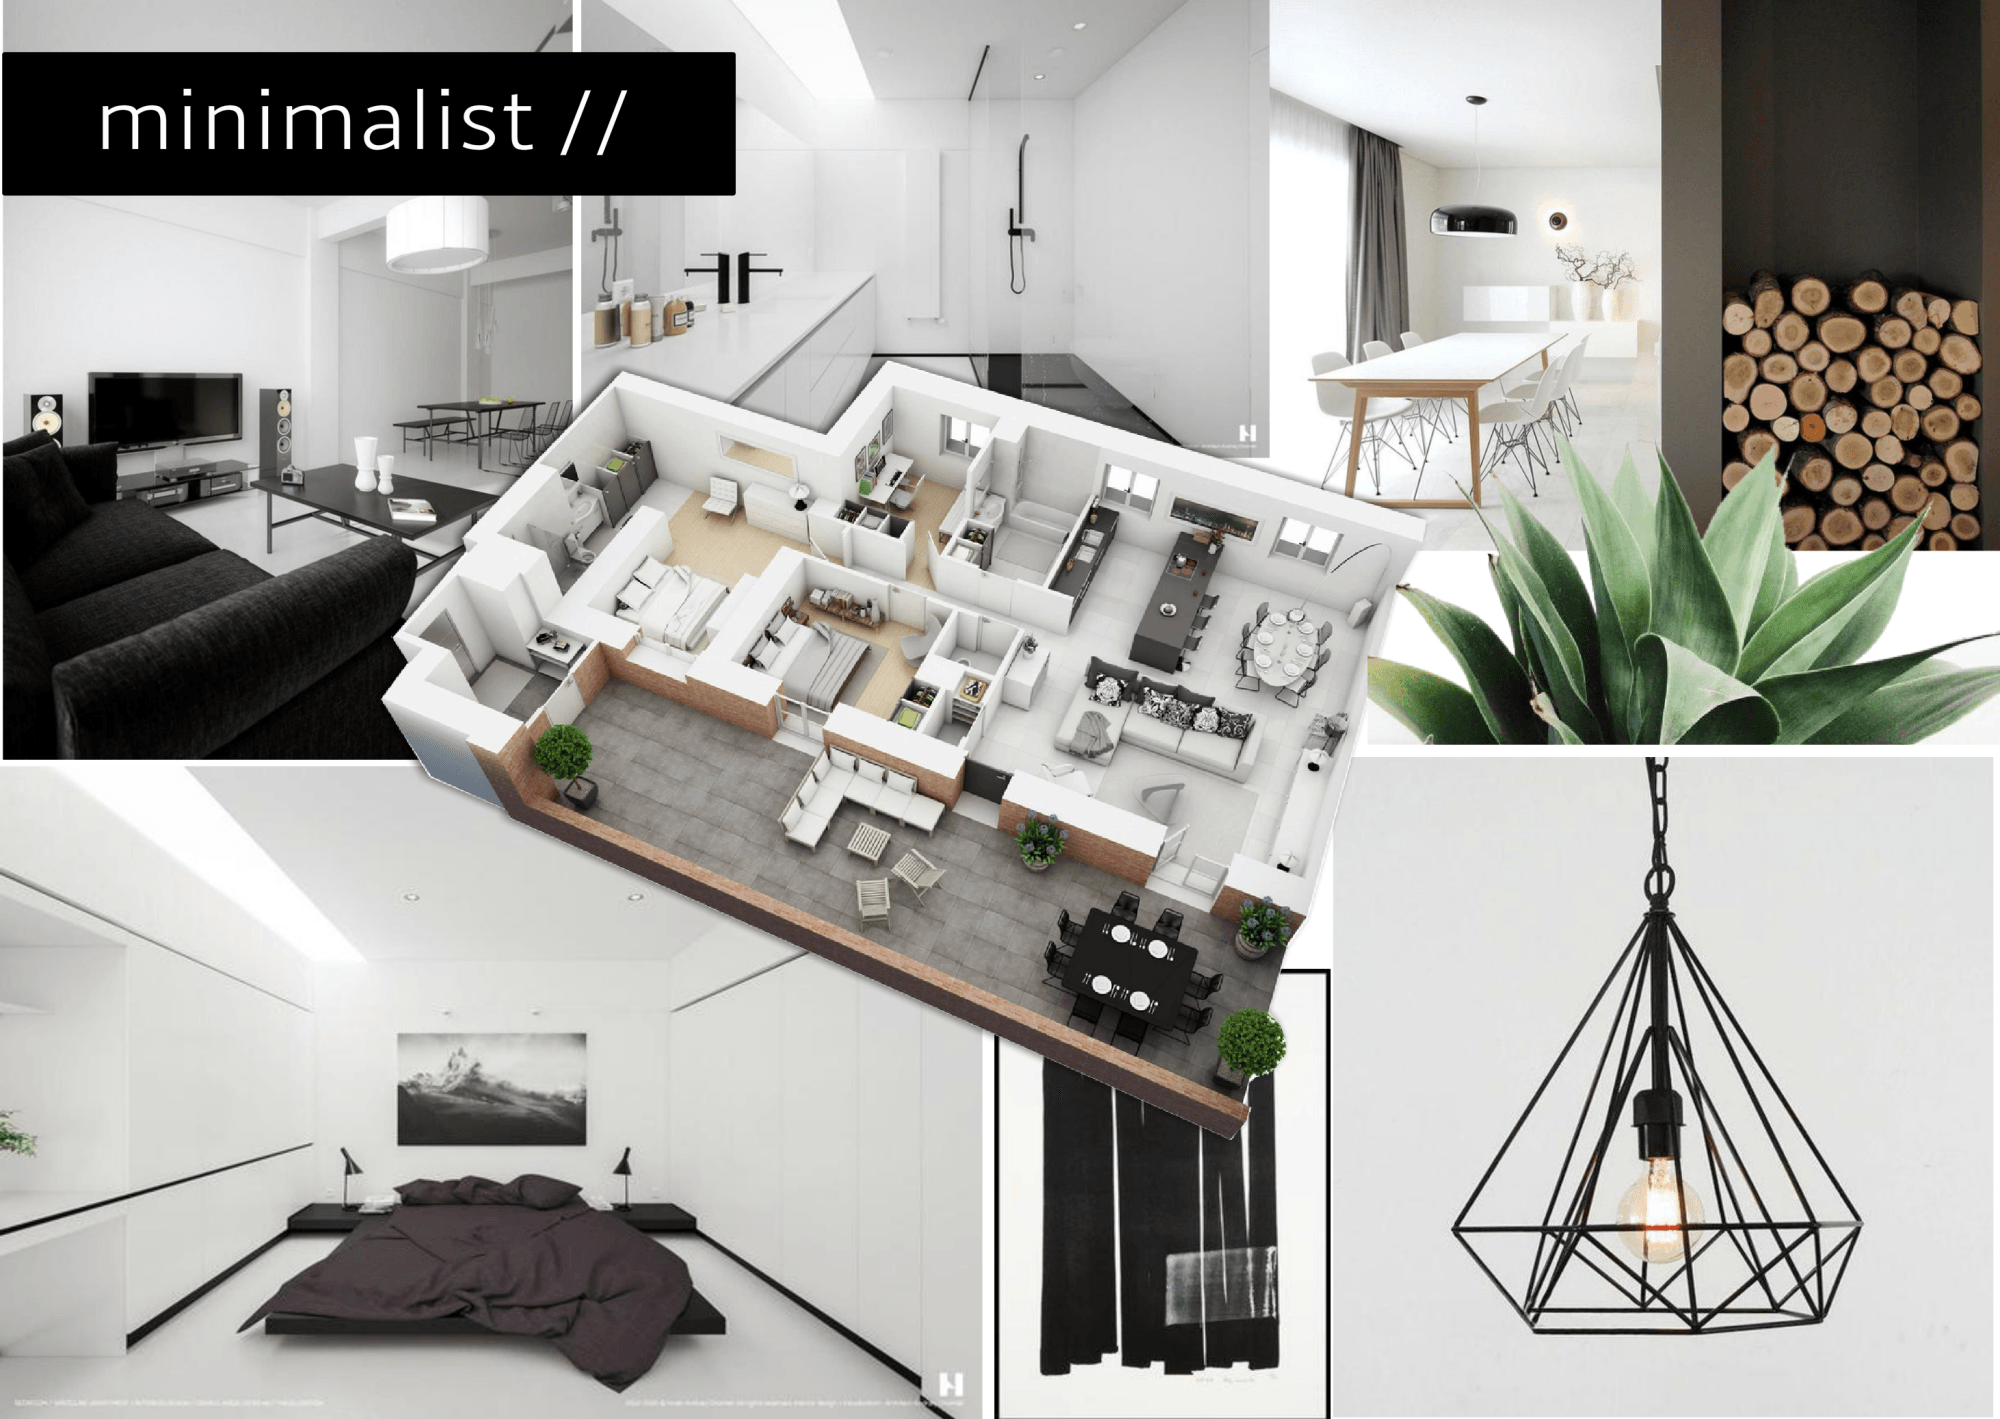 Minimalist Interior Design Moodboard Ebene villa